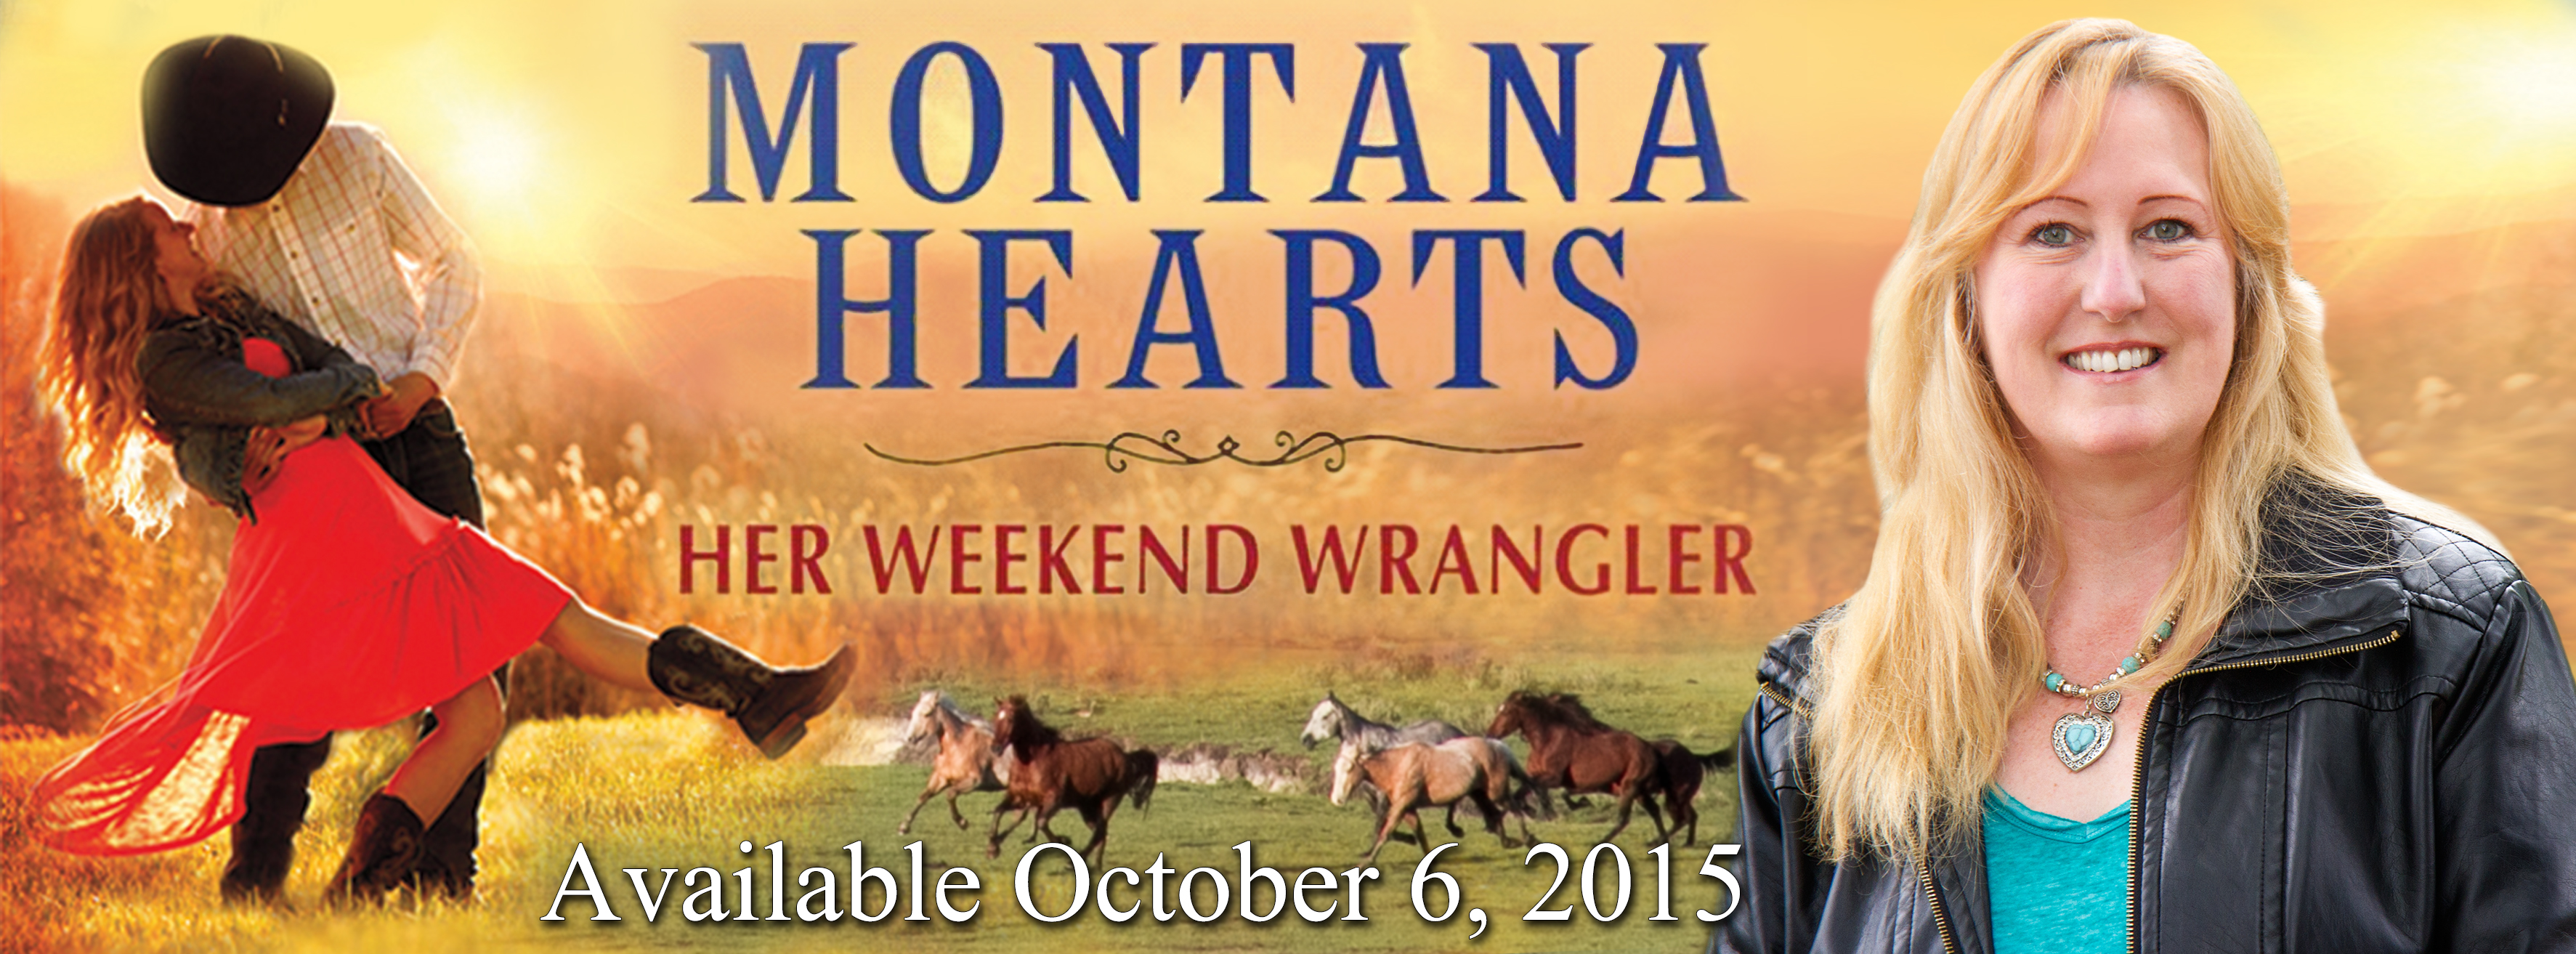 Darlene-Panzera-Montana-Hearts-Her-Weekened-Wrangler